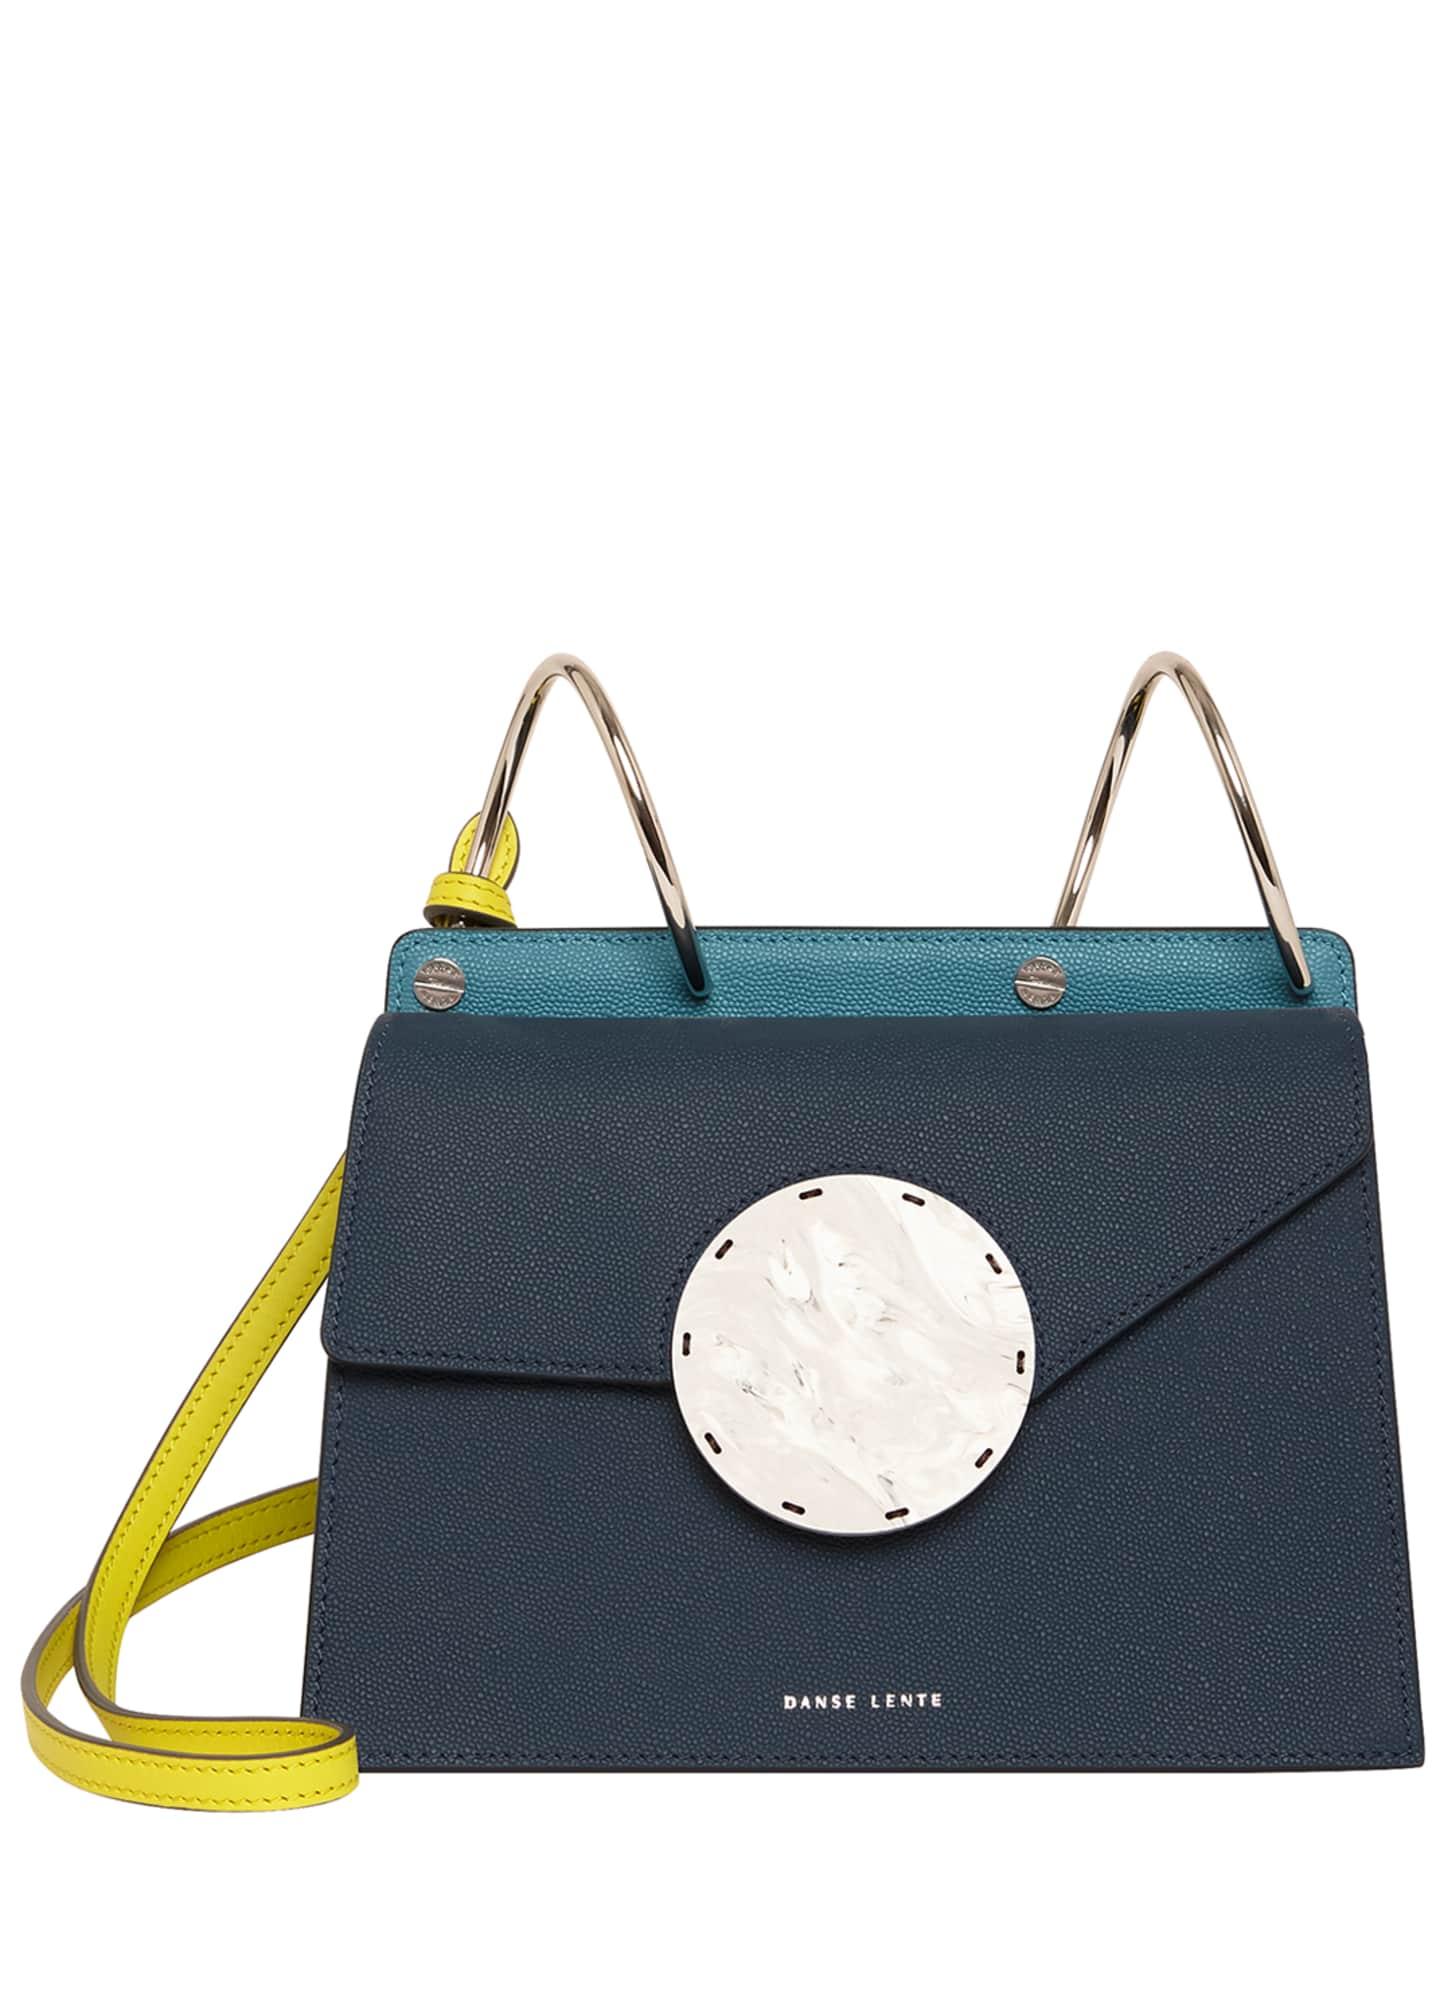 Danse Lente Phoebe Bis Leather Coil-Top Satchel Bag